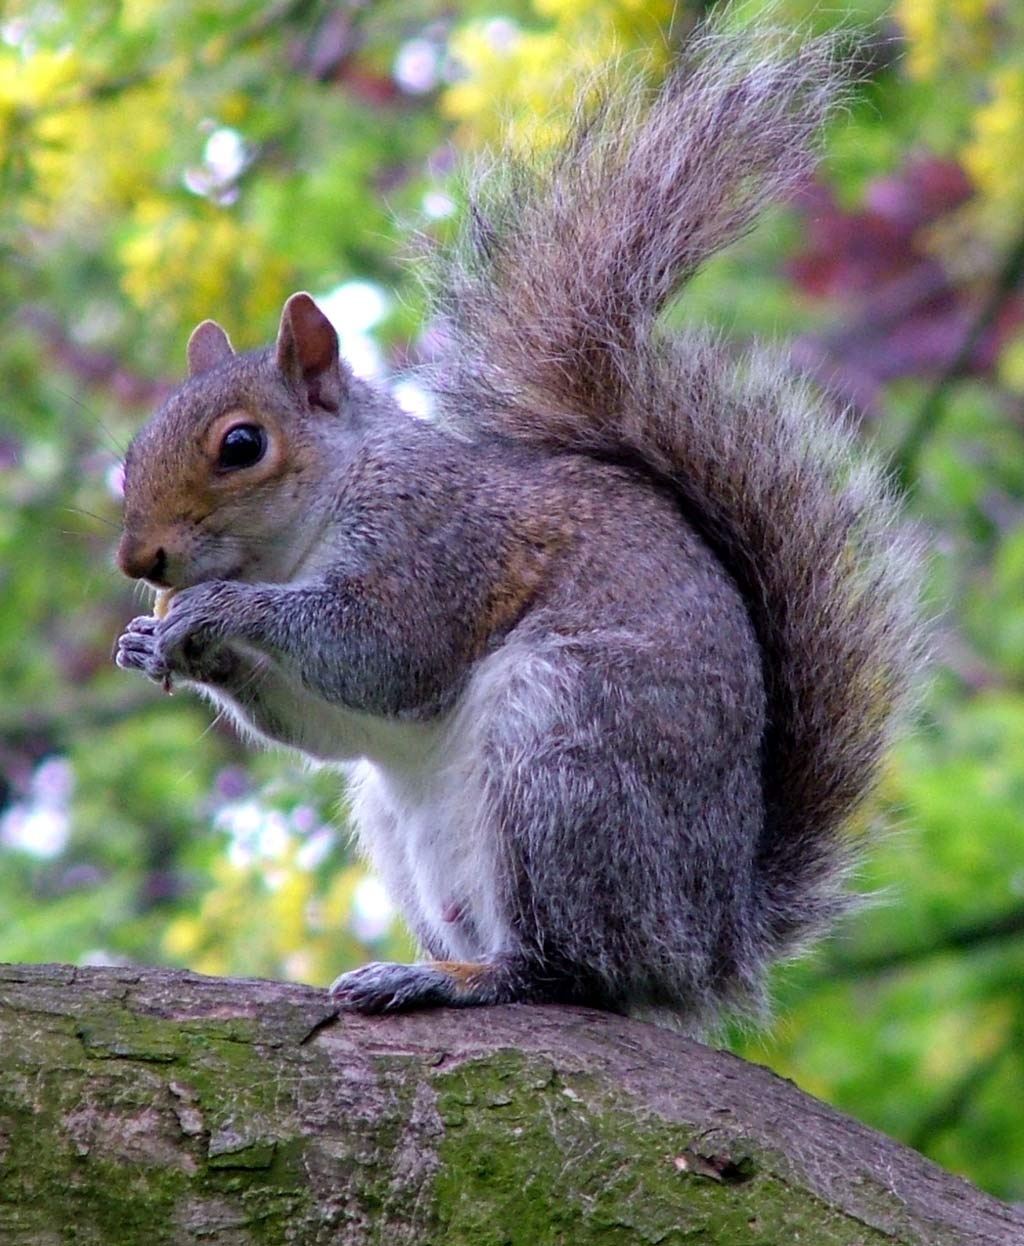 1).jpg. http://duncraft.atom5.com/files/squirrel